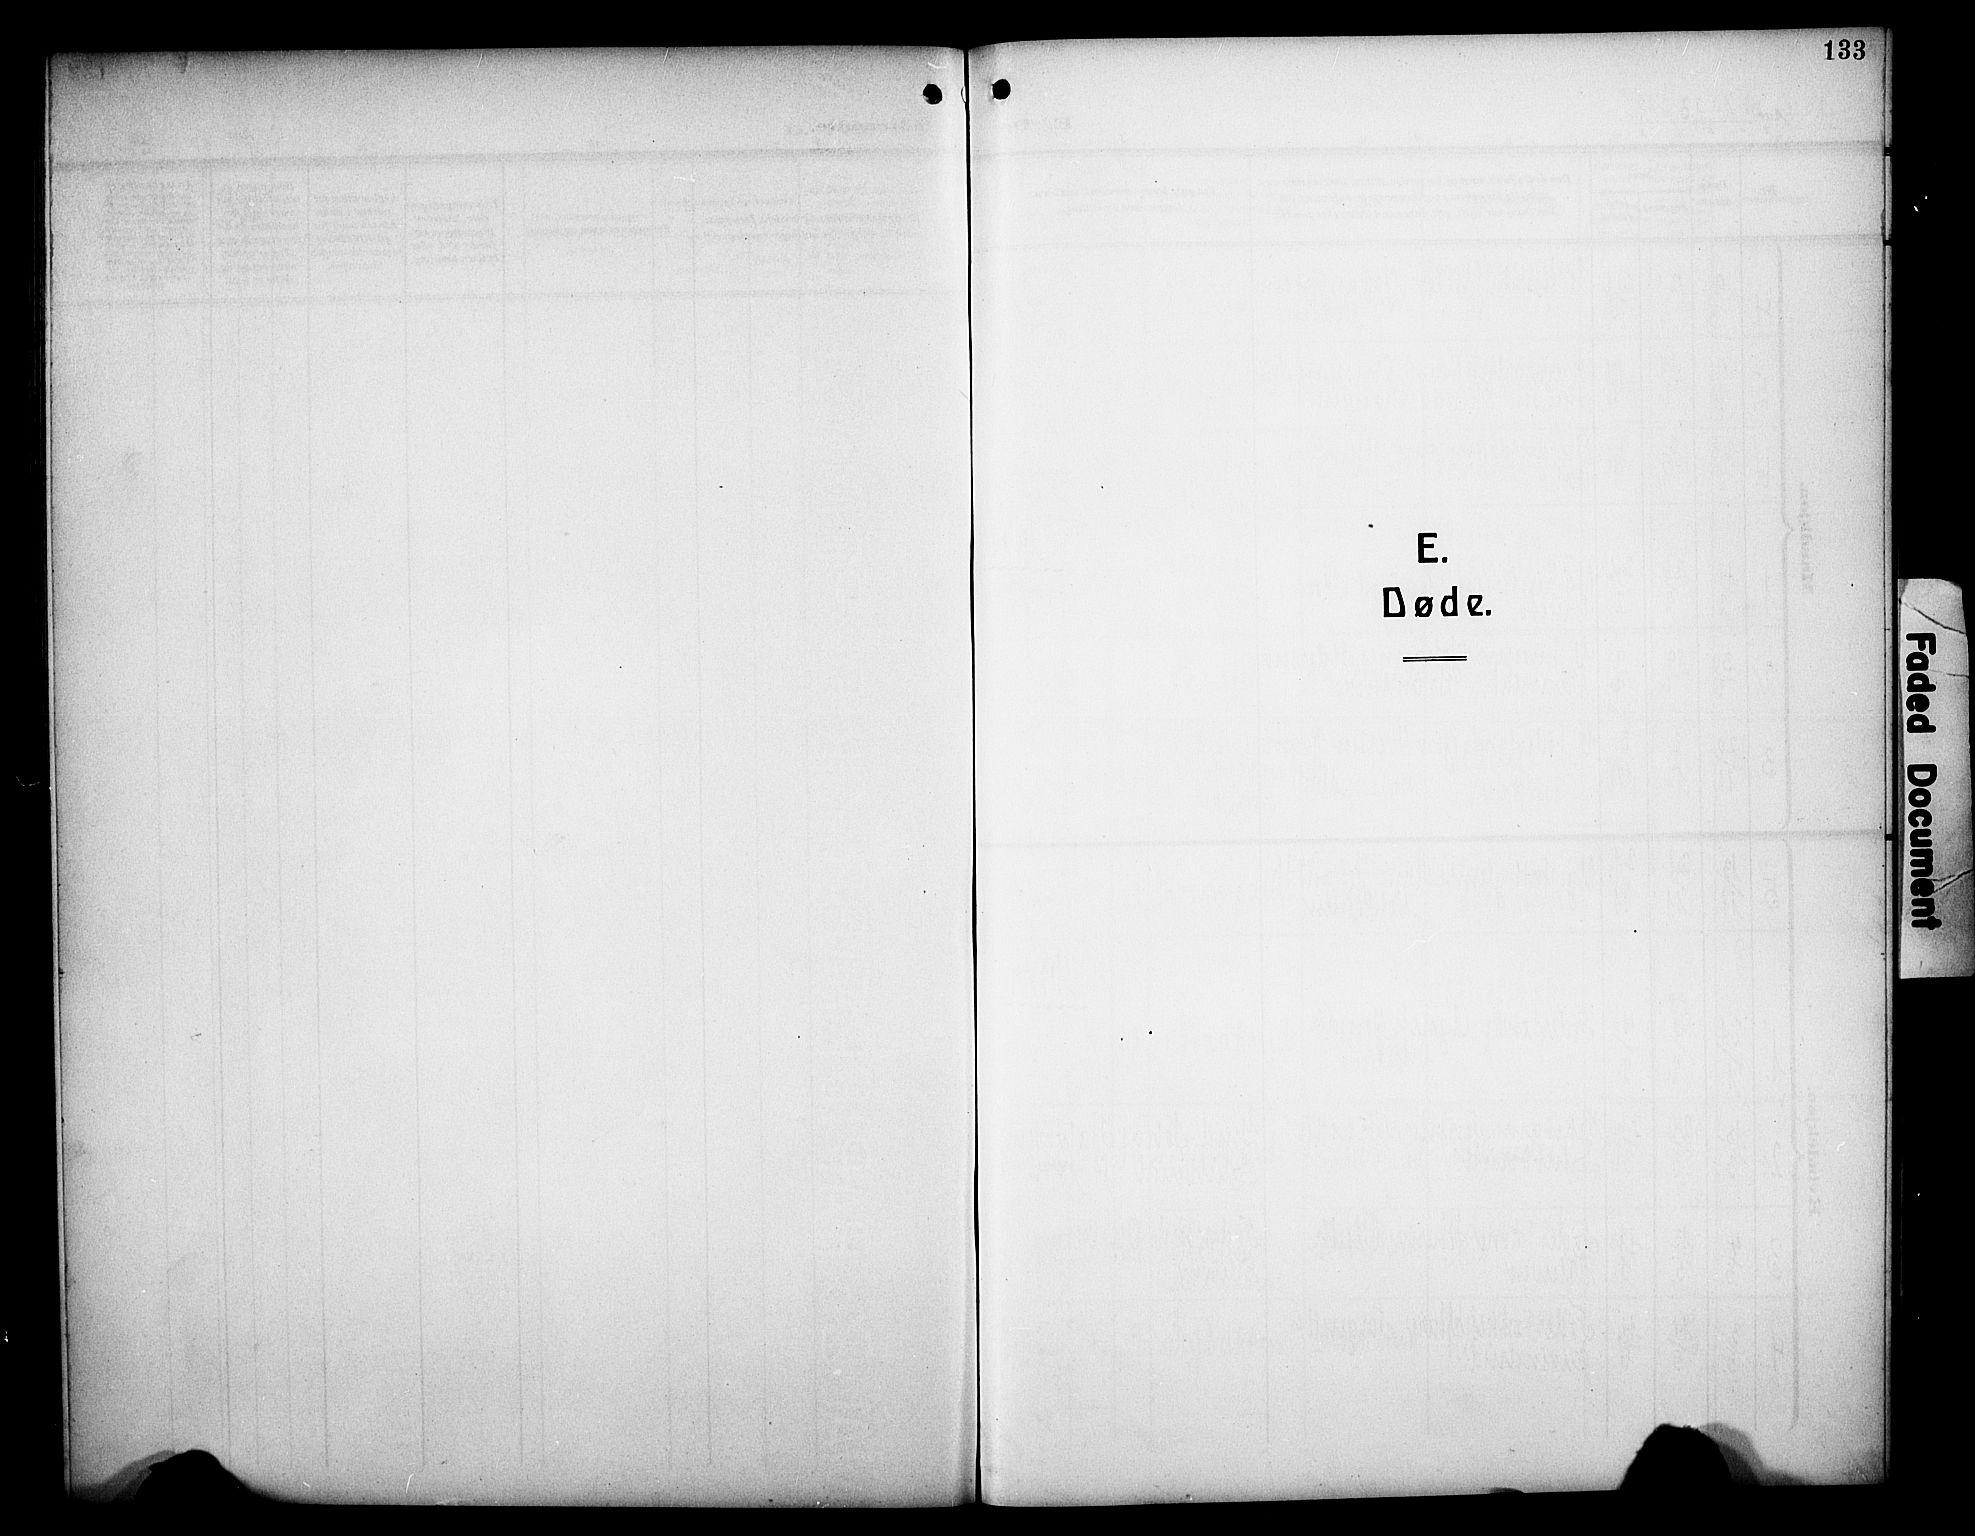 SAH, Øyer prestekontor, Klokkerbok nr. 7, 1913-1928, s. 133